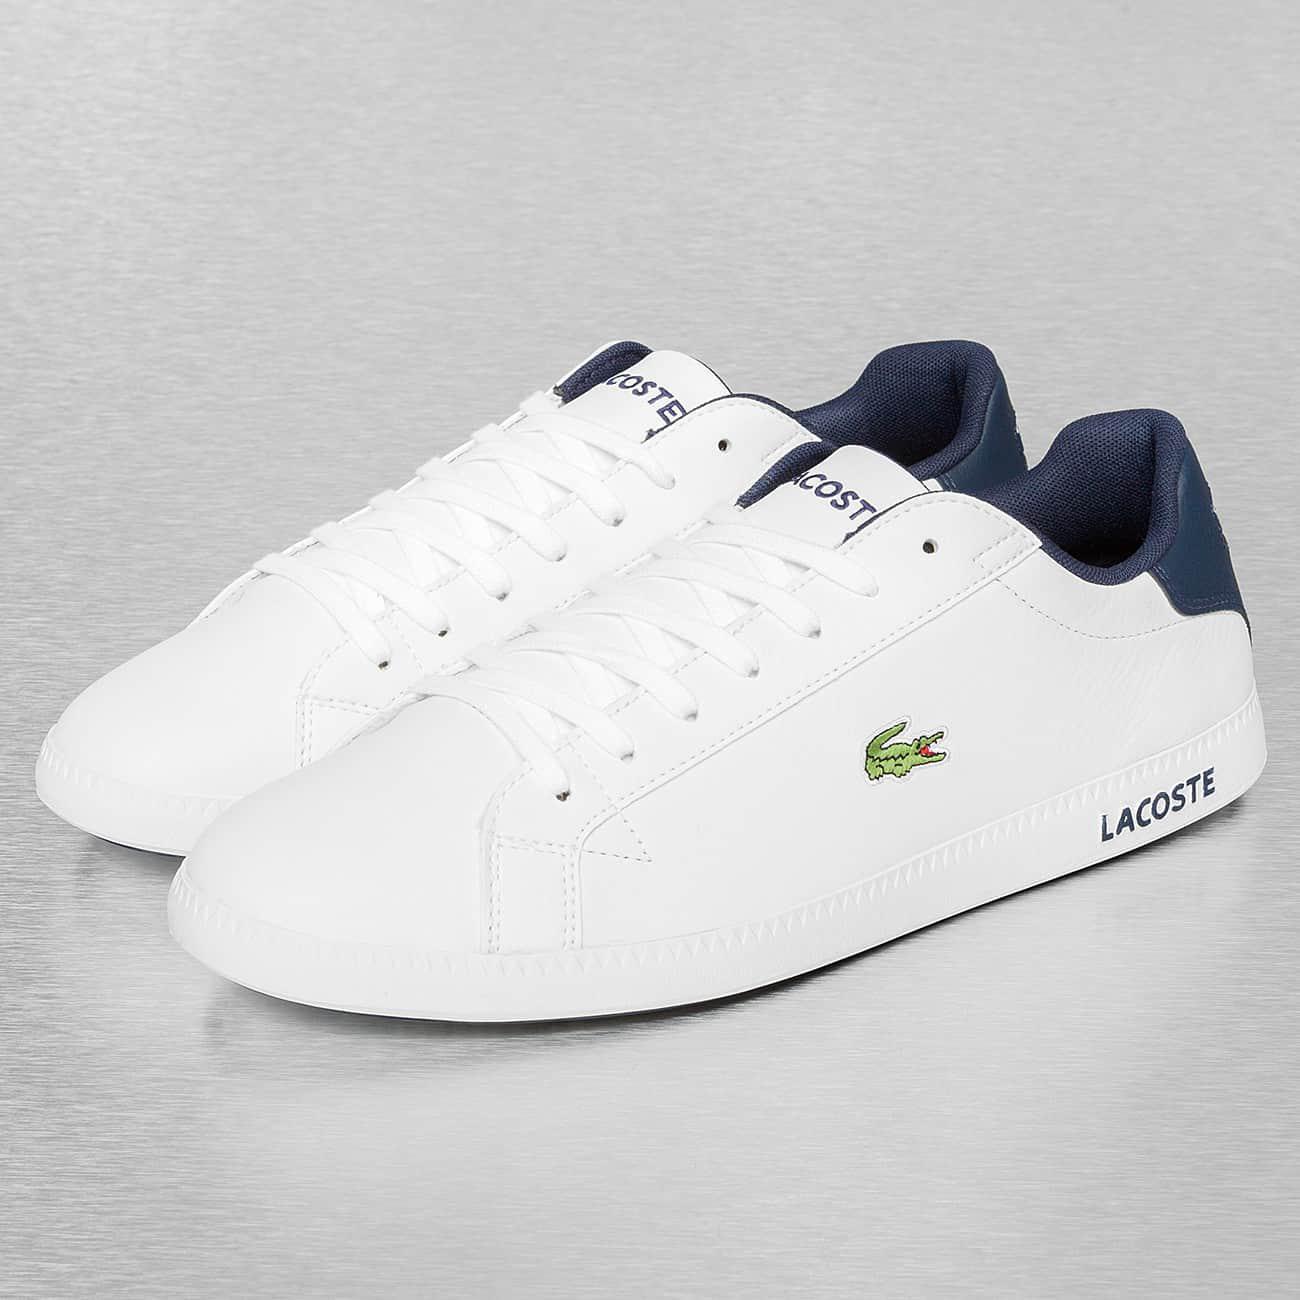 e6c5003ba28239 Lacoste - White Sneakers Graduate Lcr3 Spm for Men - Lyst. View Fullscreen